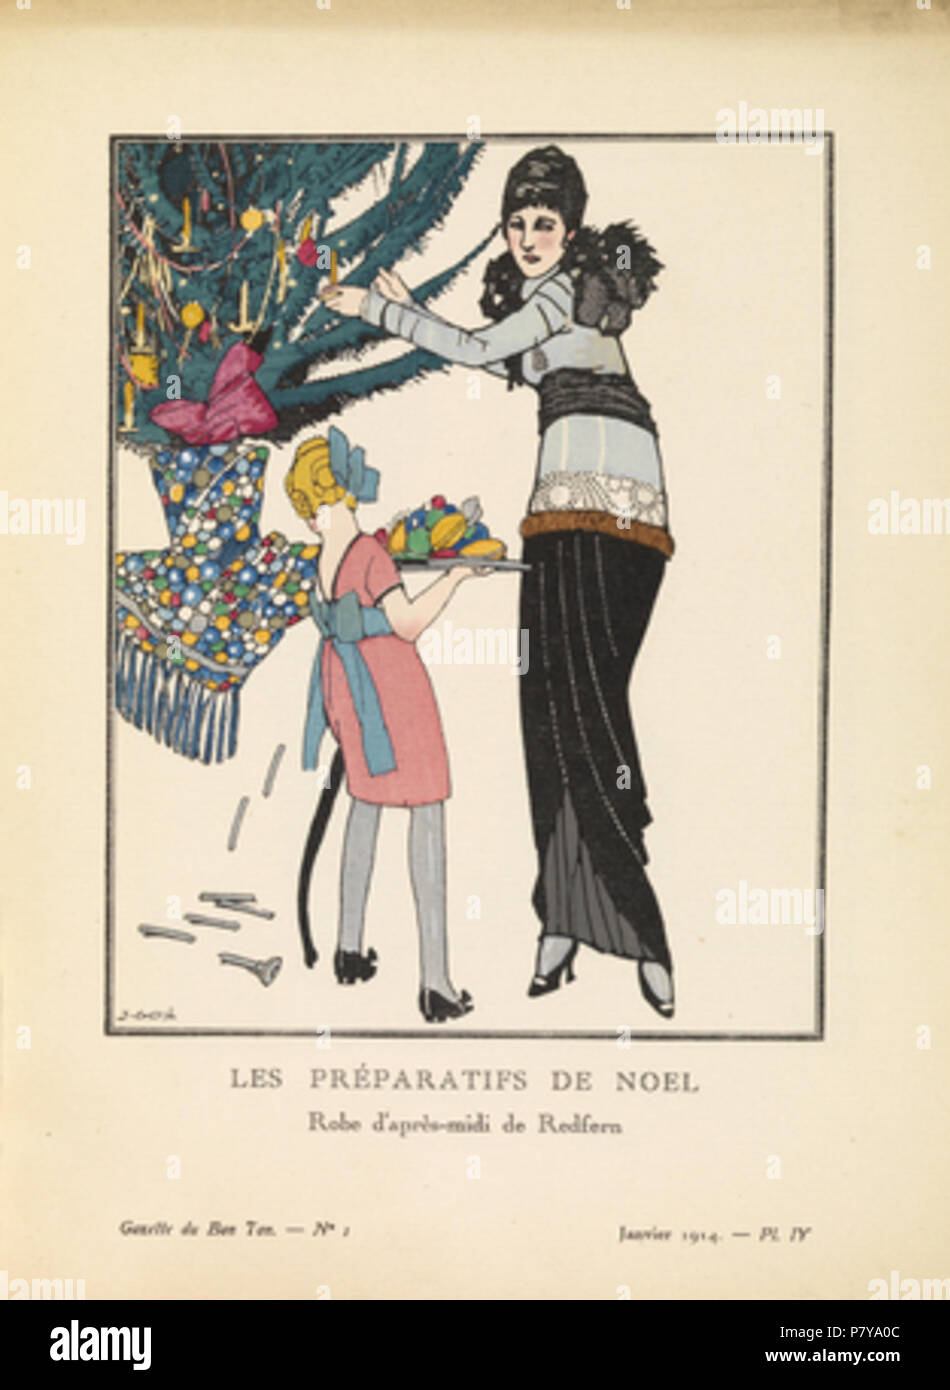 Mode Platte von 1914 La Gazette du Bon Ton Titel: \'Les Préparitifs ...